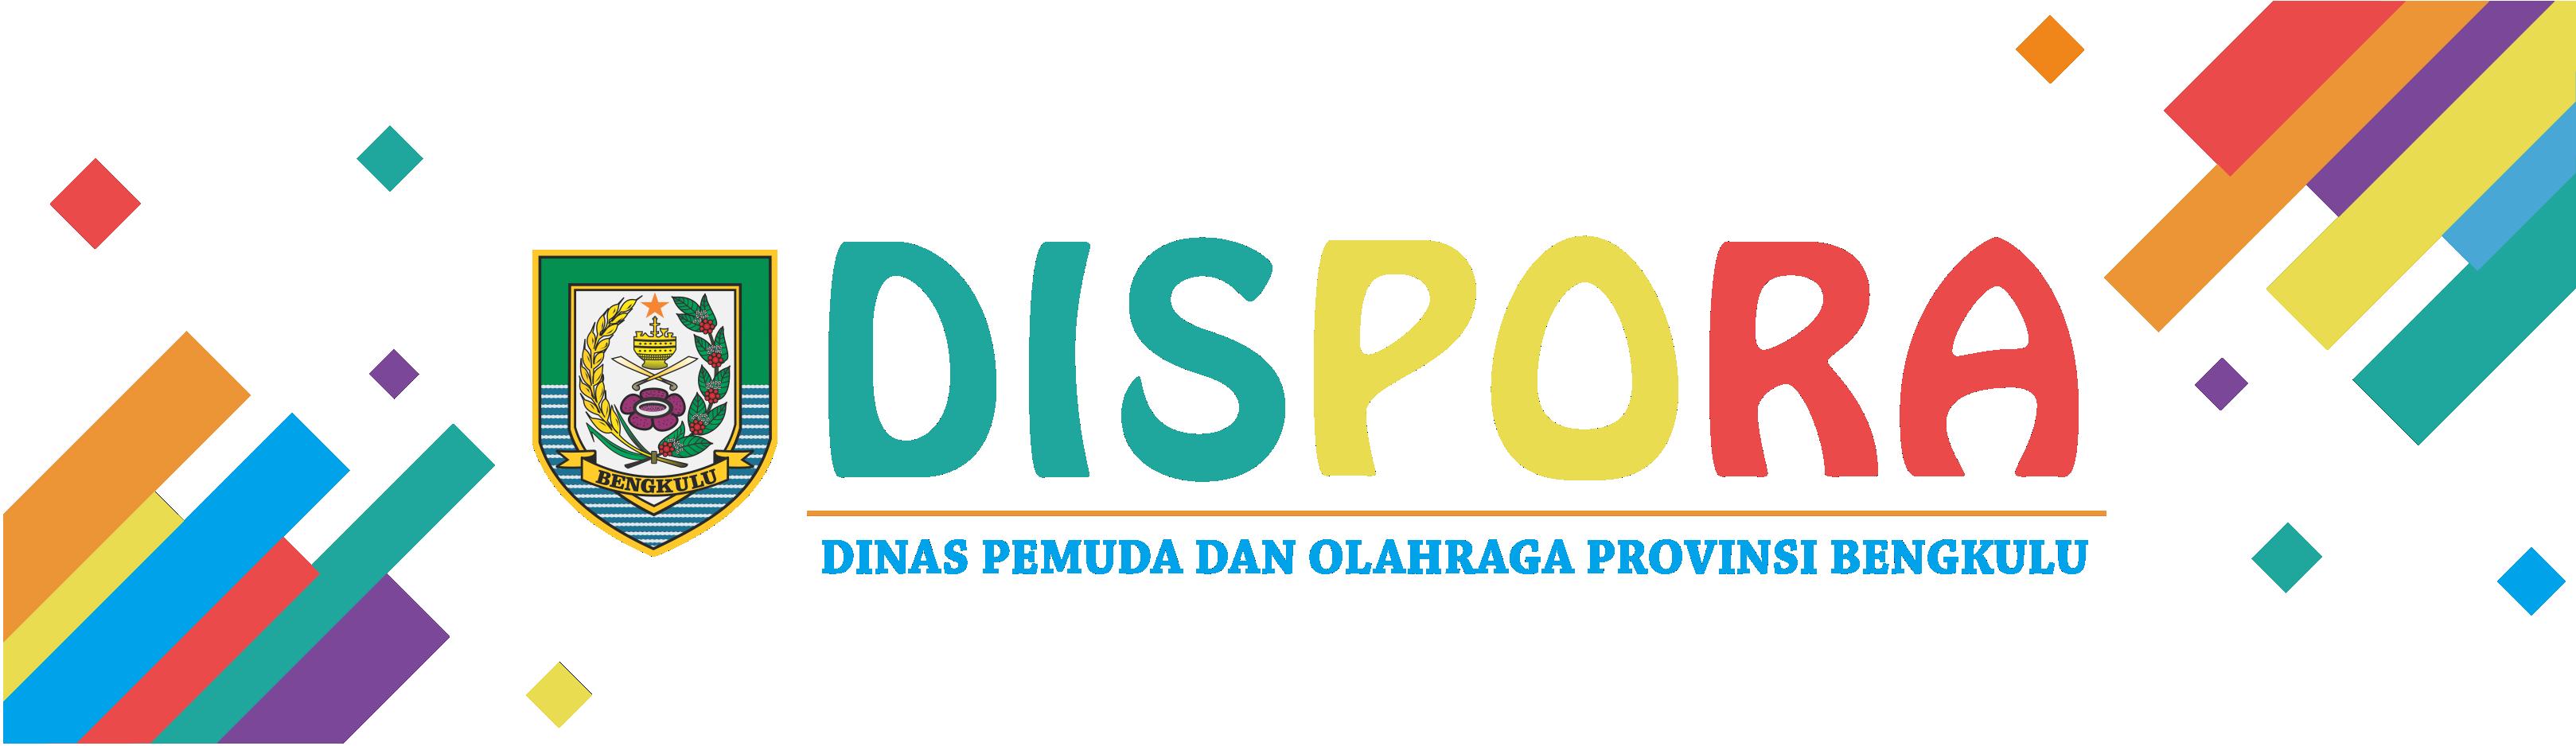 DISPORA